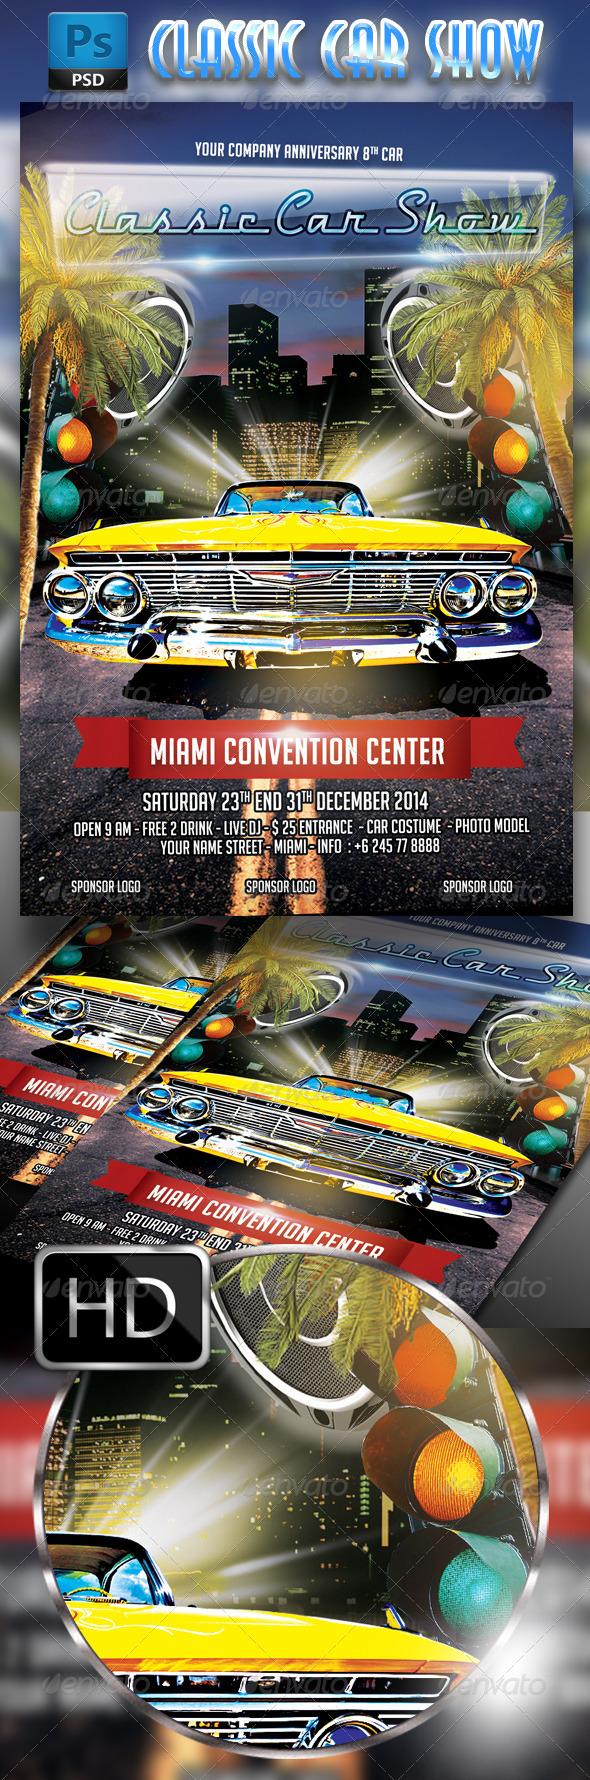 GraphicRiver Classic Car Show flyer 7933628